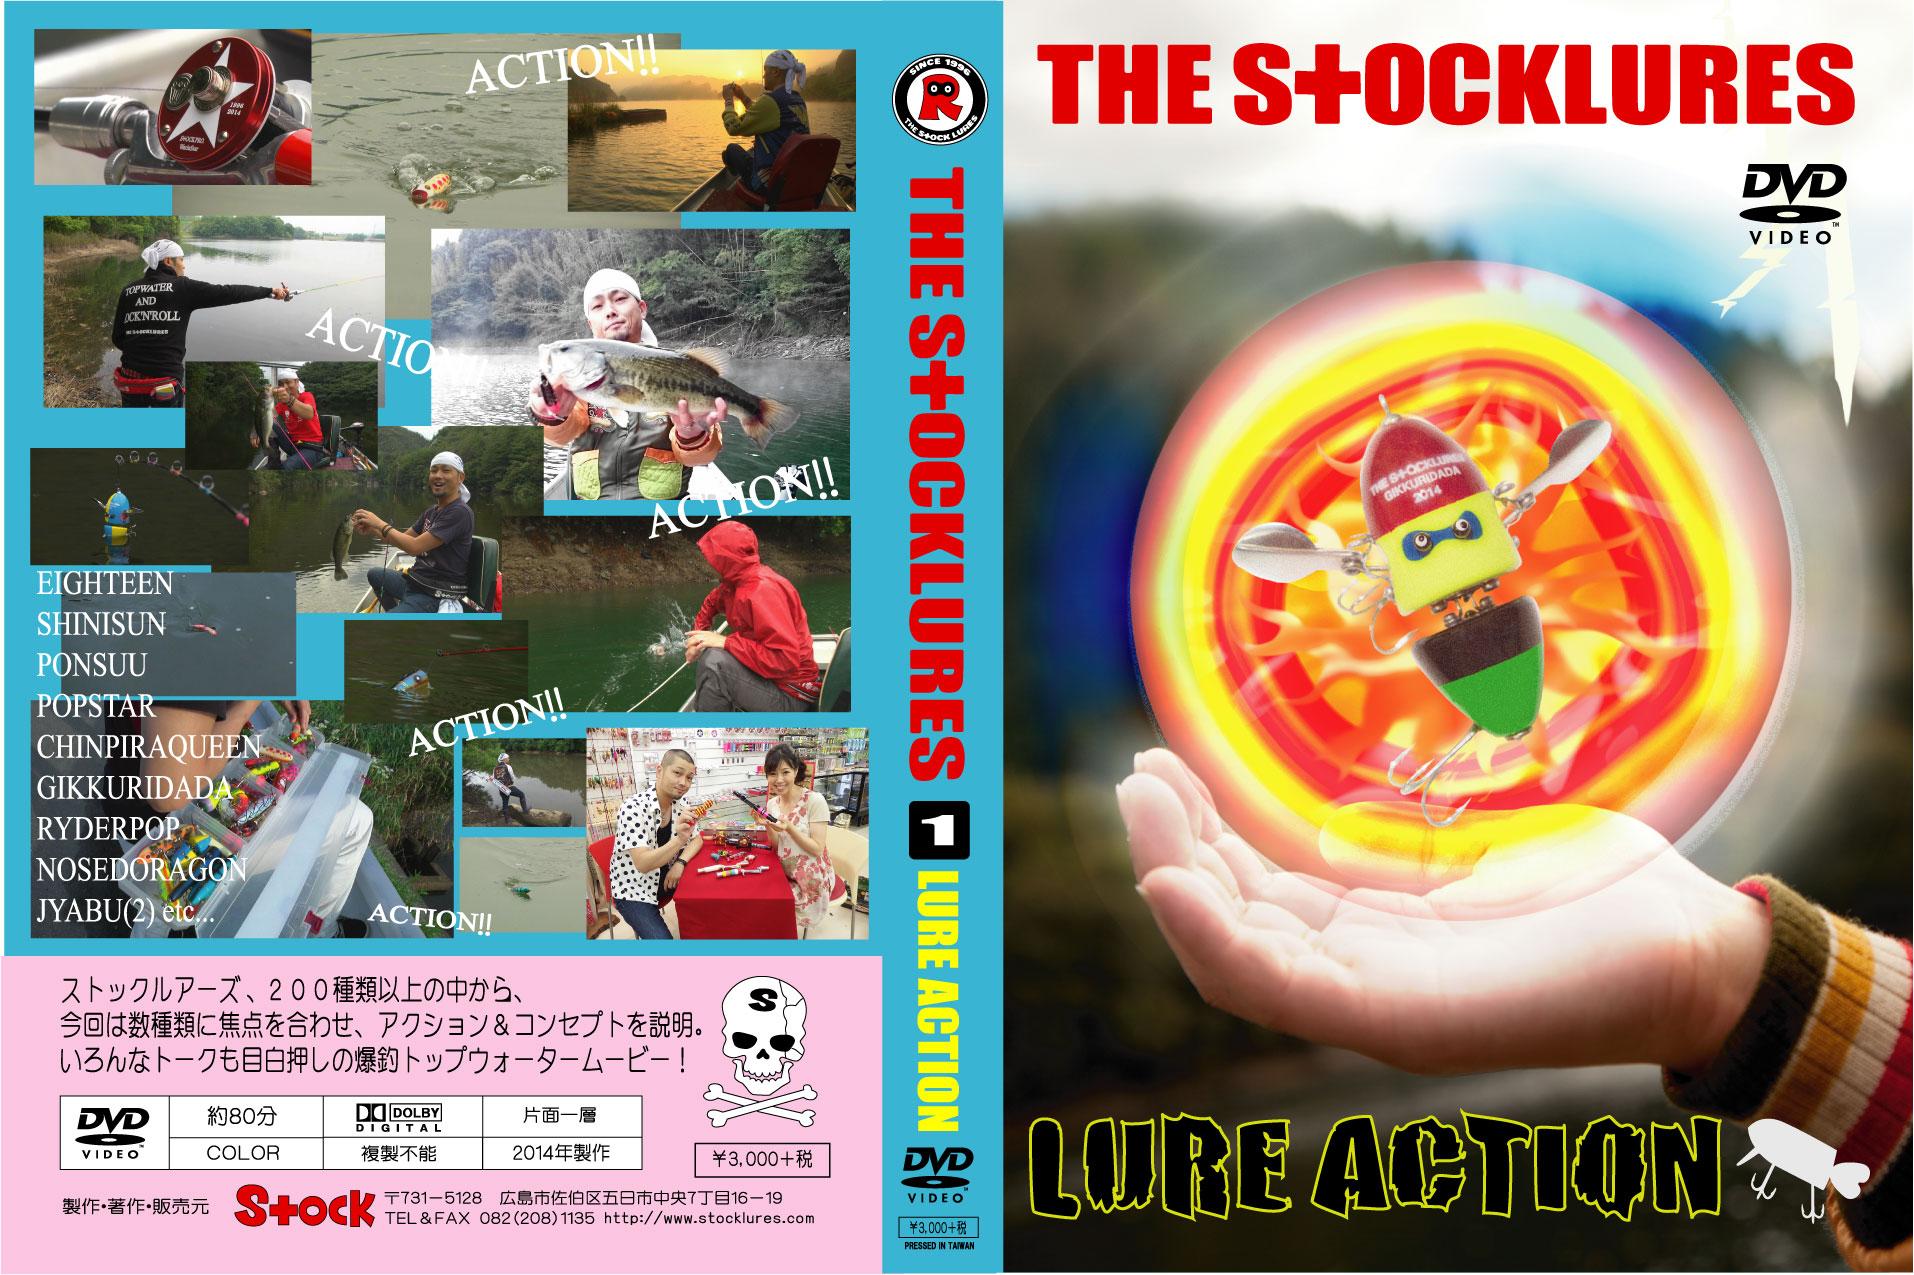 STOCKLURES(LUREACTION)2014.jpg